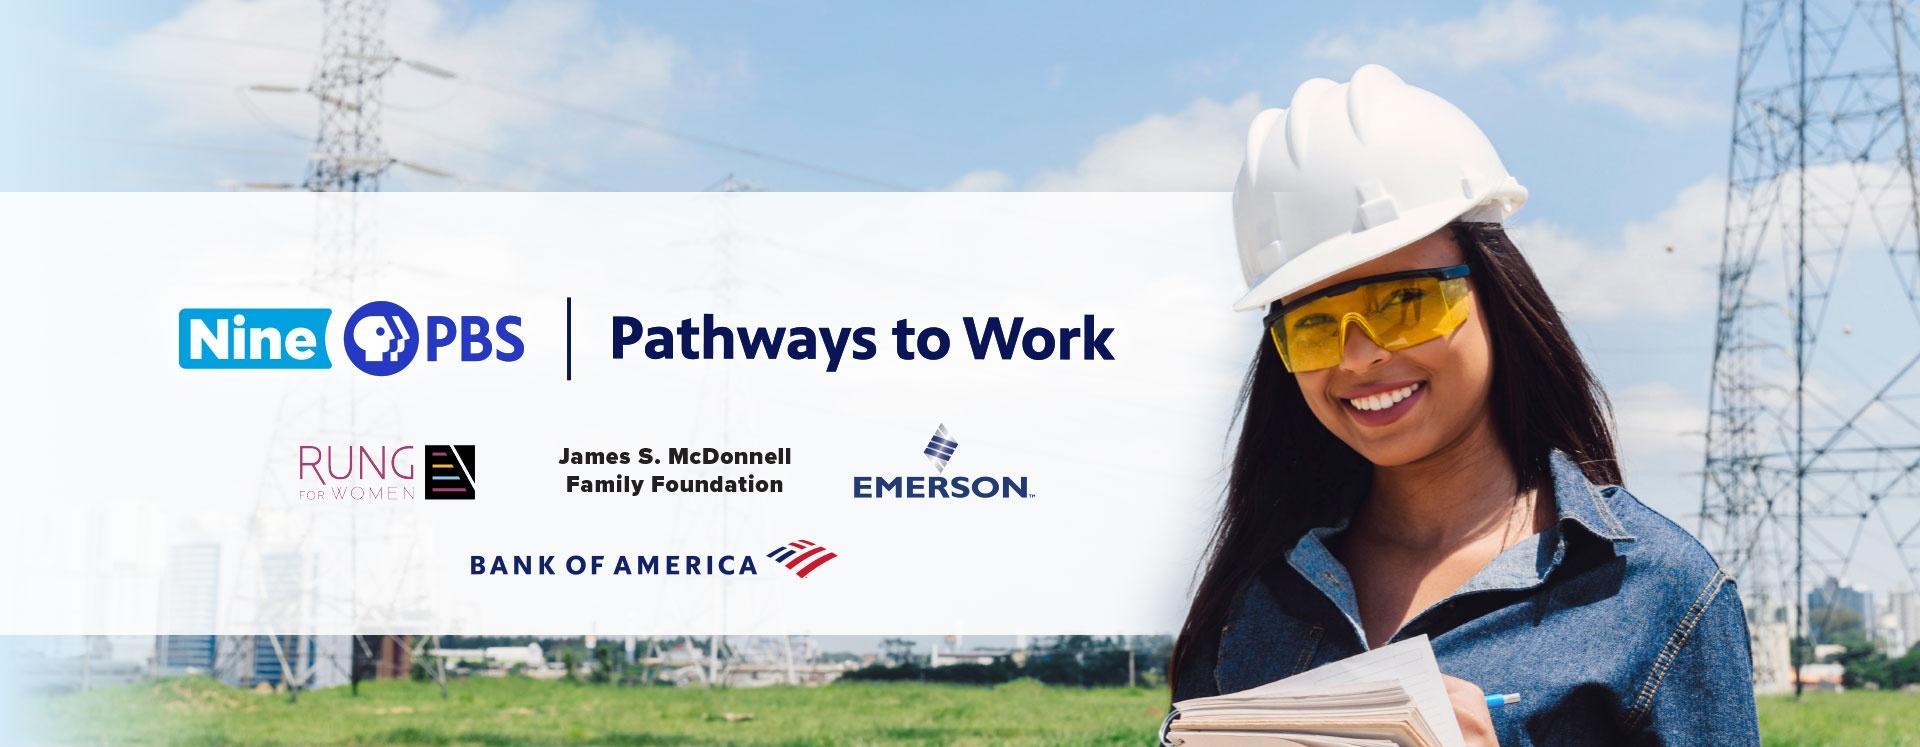 Pathways to Work